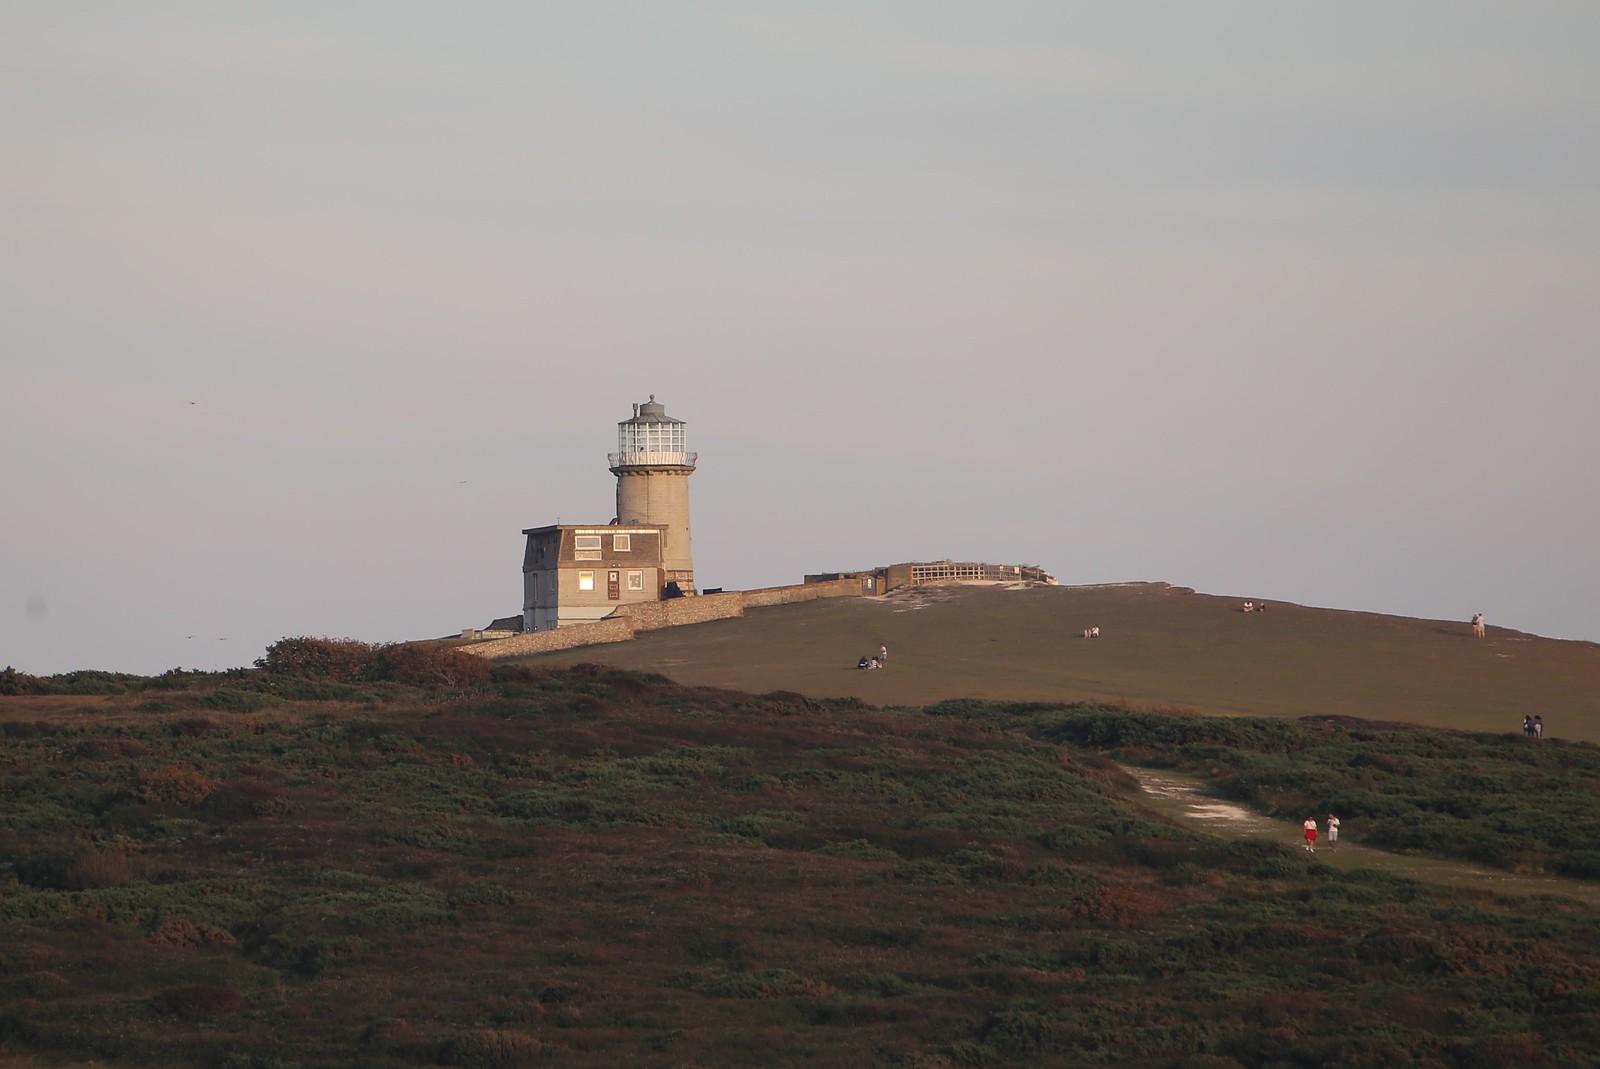 Belle Tout lighthouse - Beachy Head